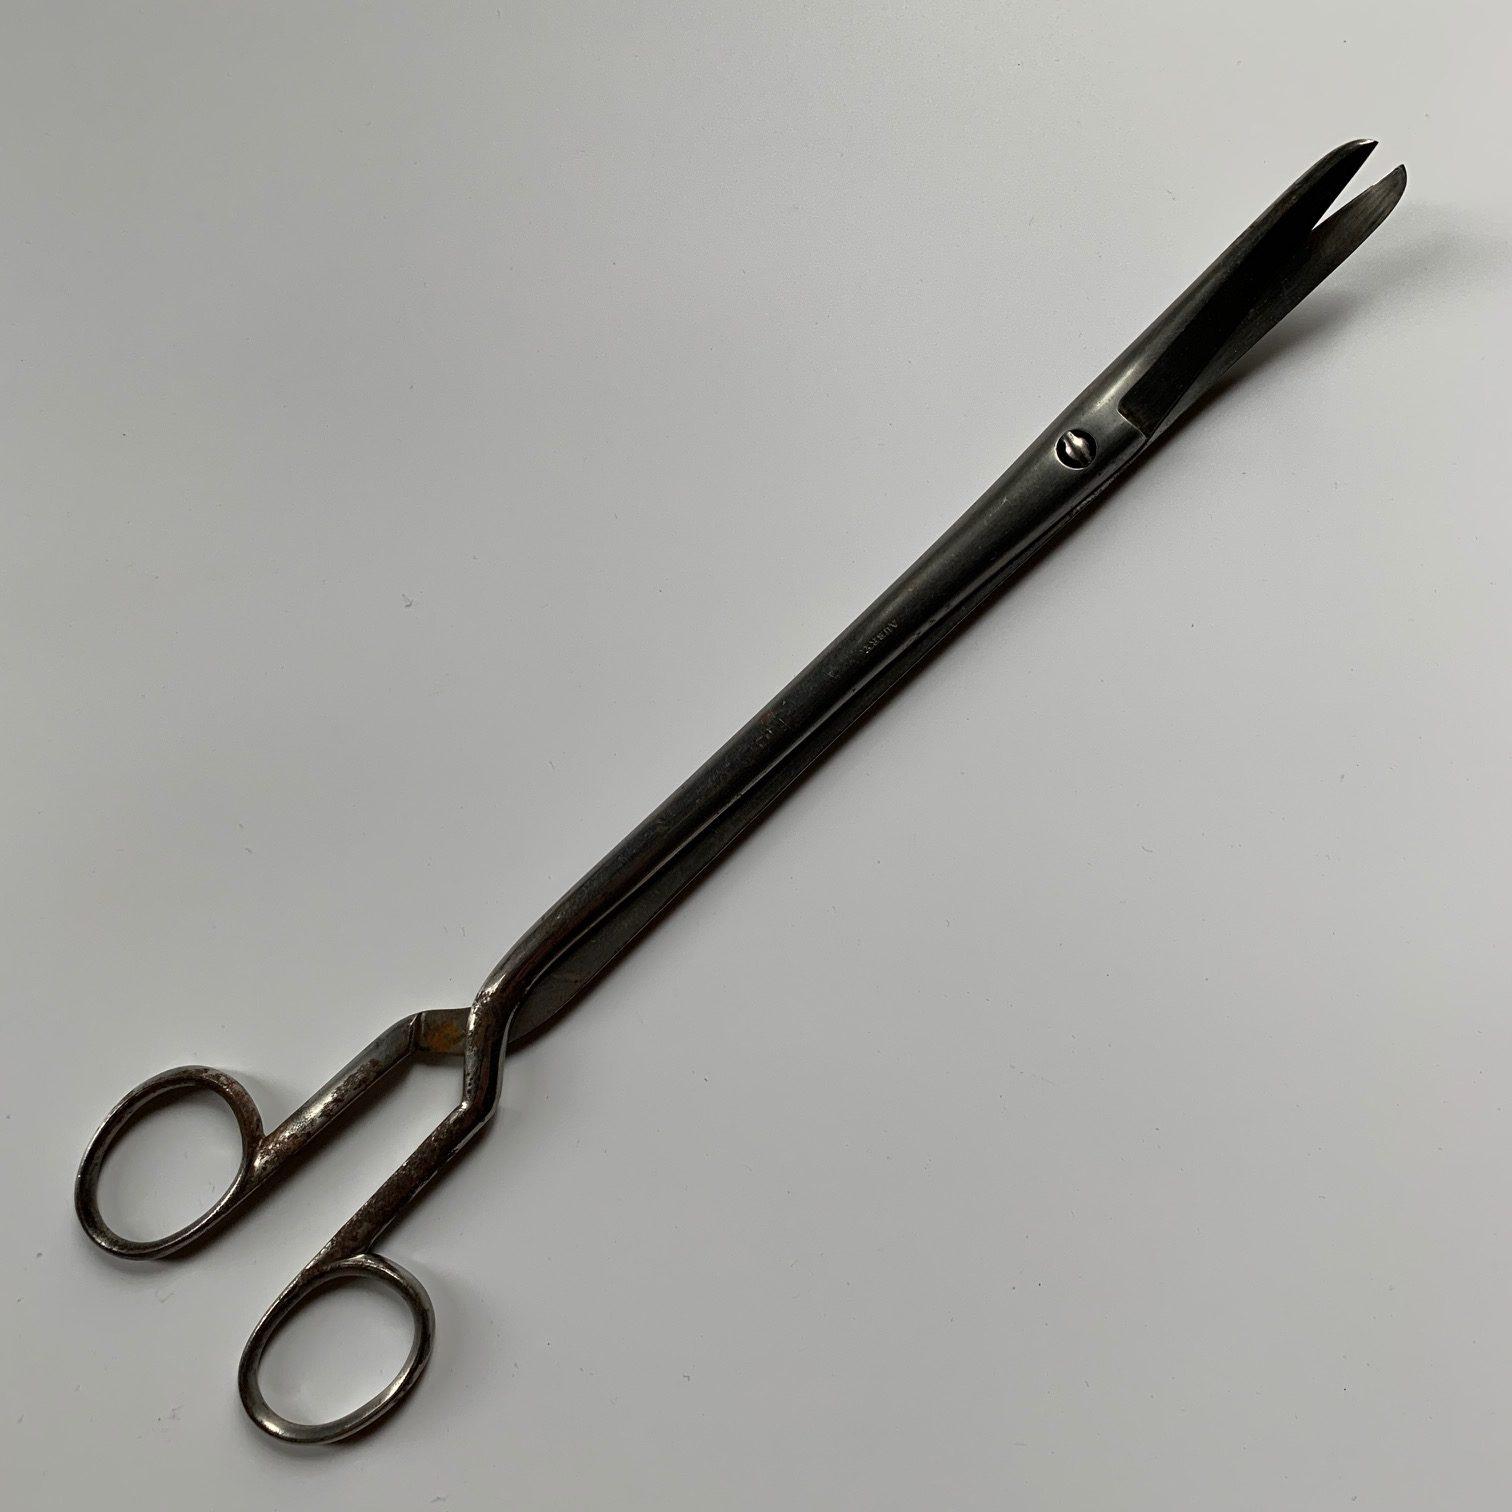 A Dubois' Embryotomy Decapitating Scissor, destructive obstetrical instrument